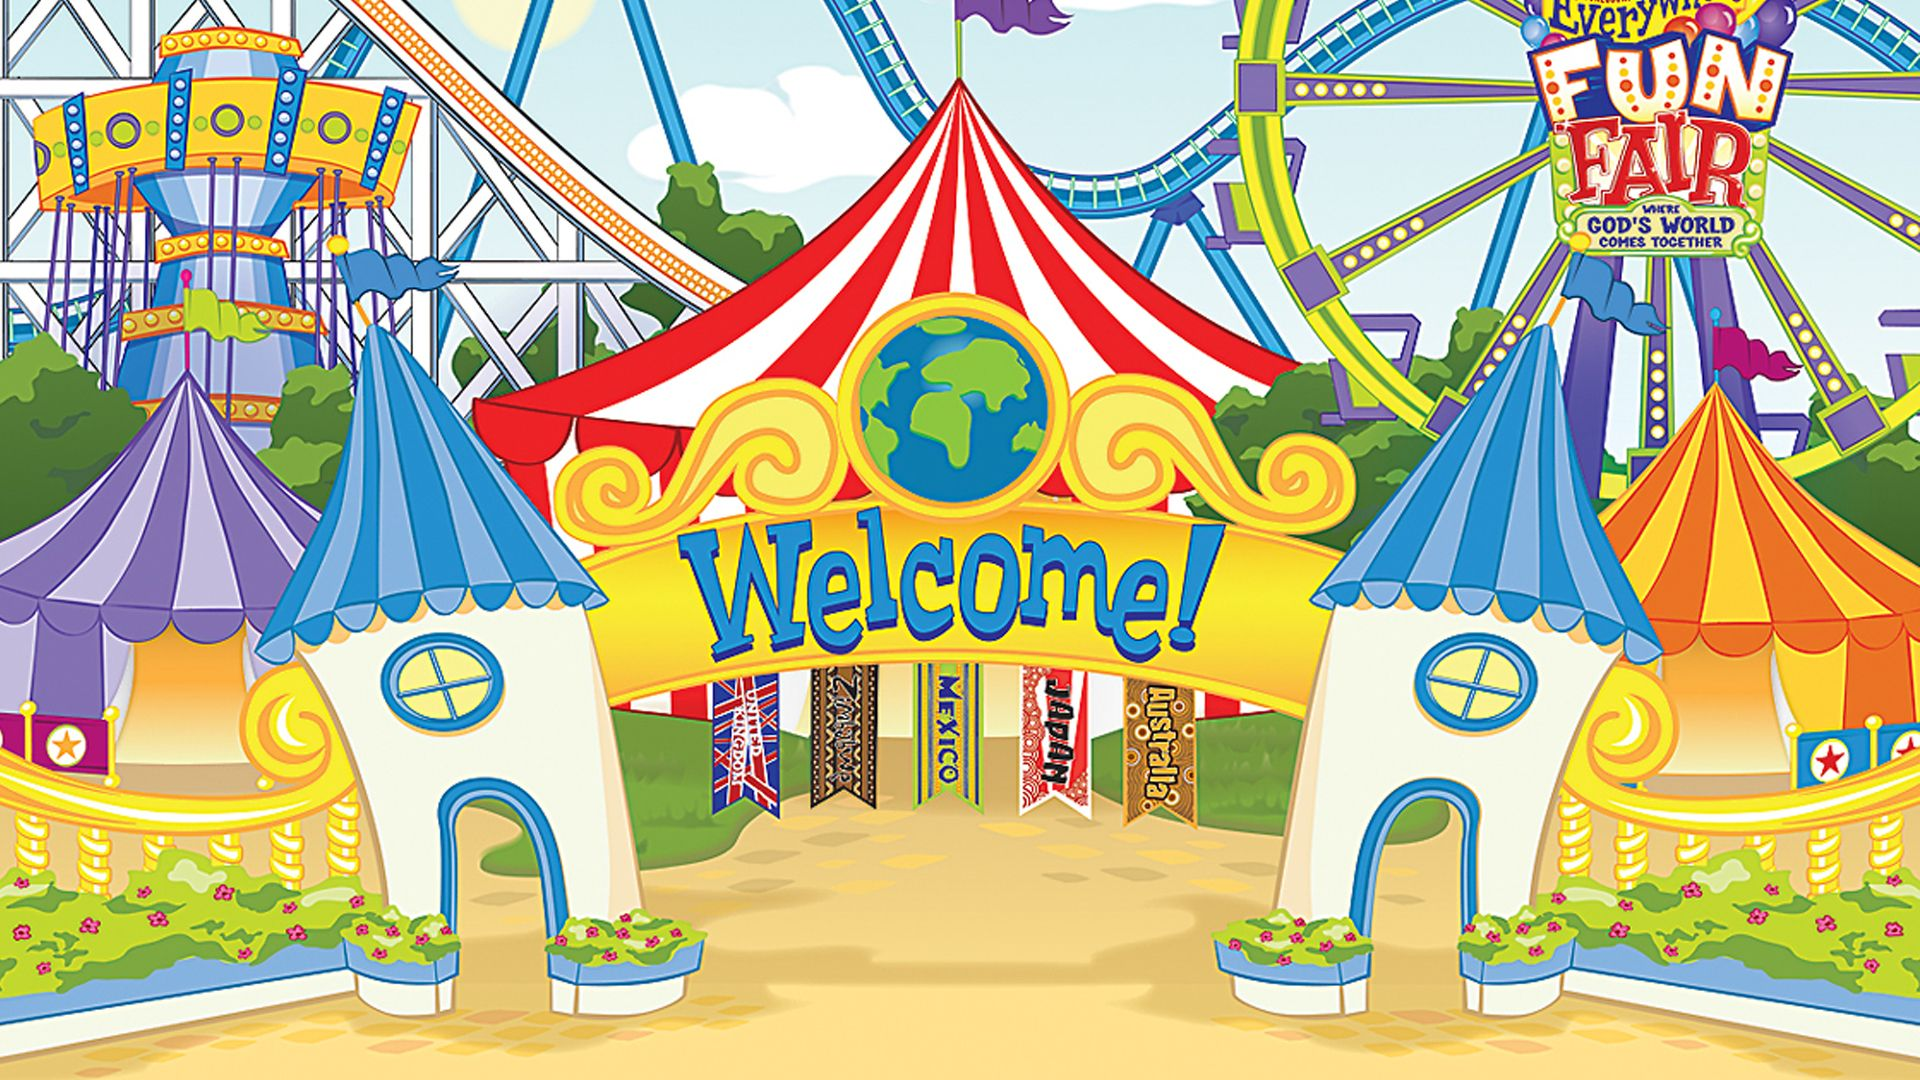 Fair clipart fairground. Welcome vacation bible school